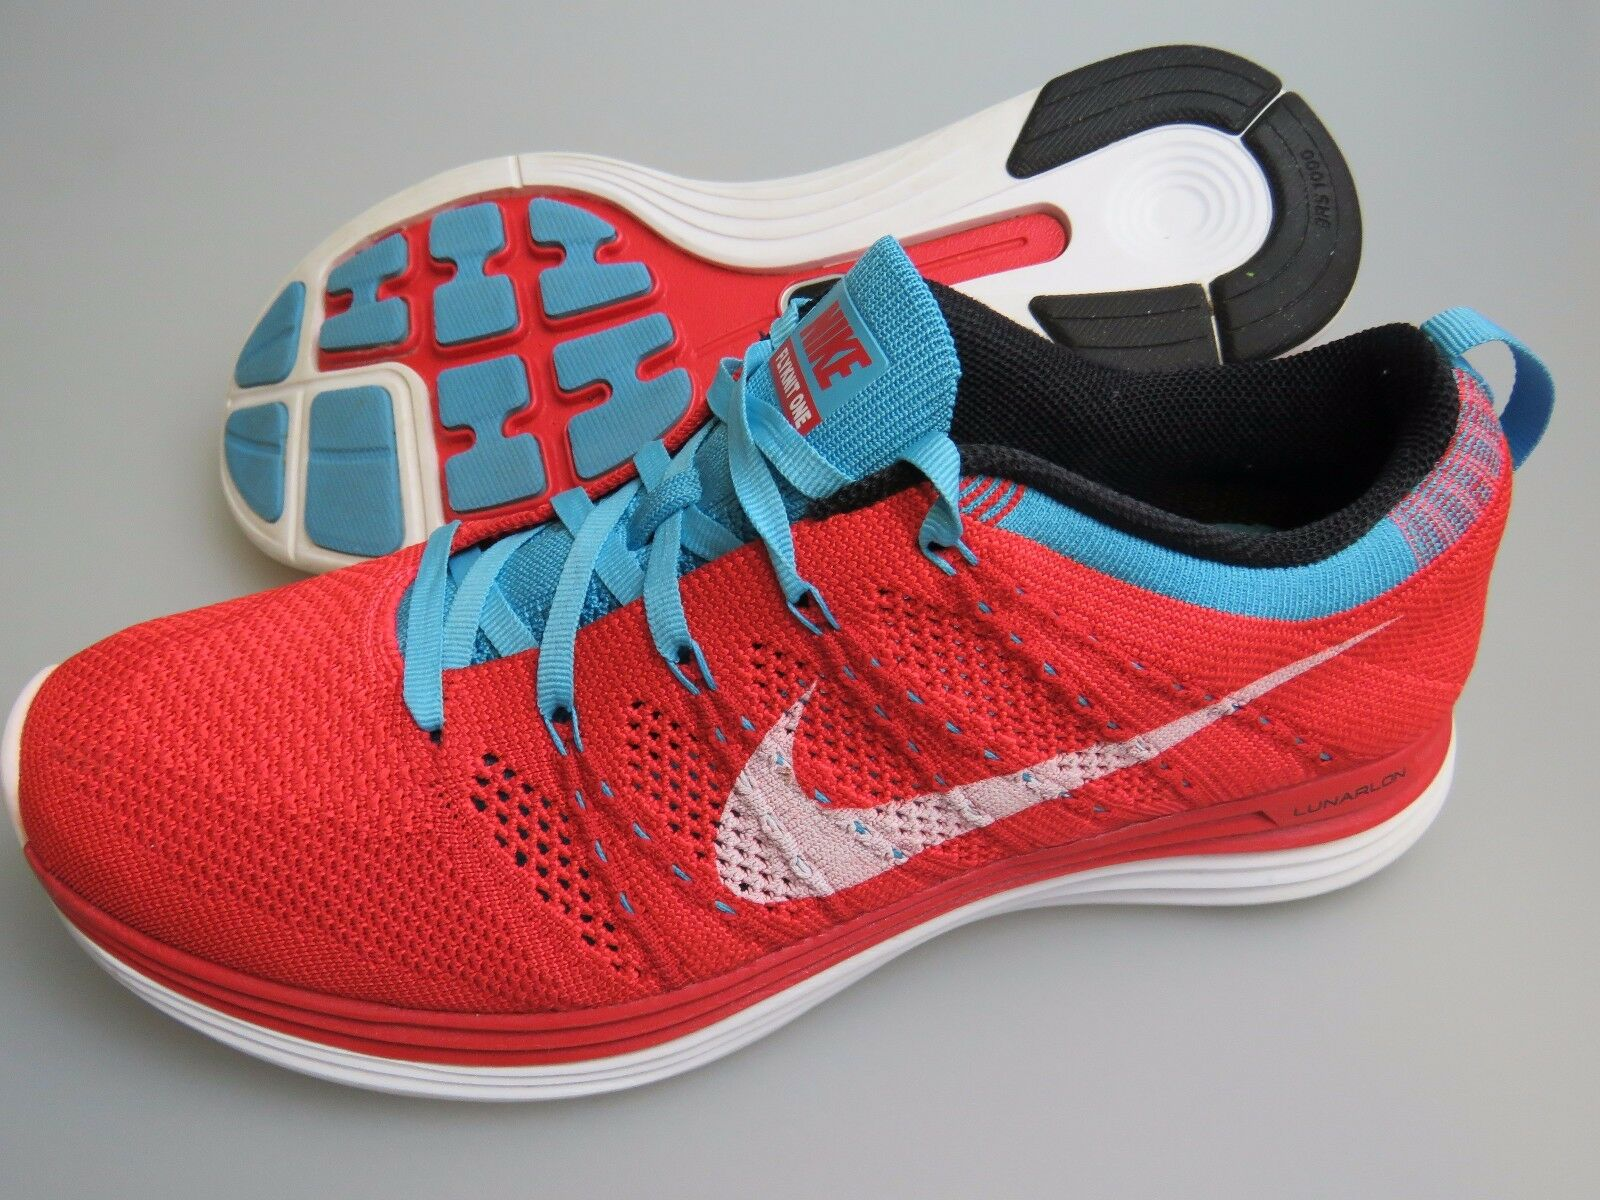 NIKE Flyknit One Flyknit 1 554888-616 Bright Red White bluee shoes Women's US 10